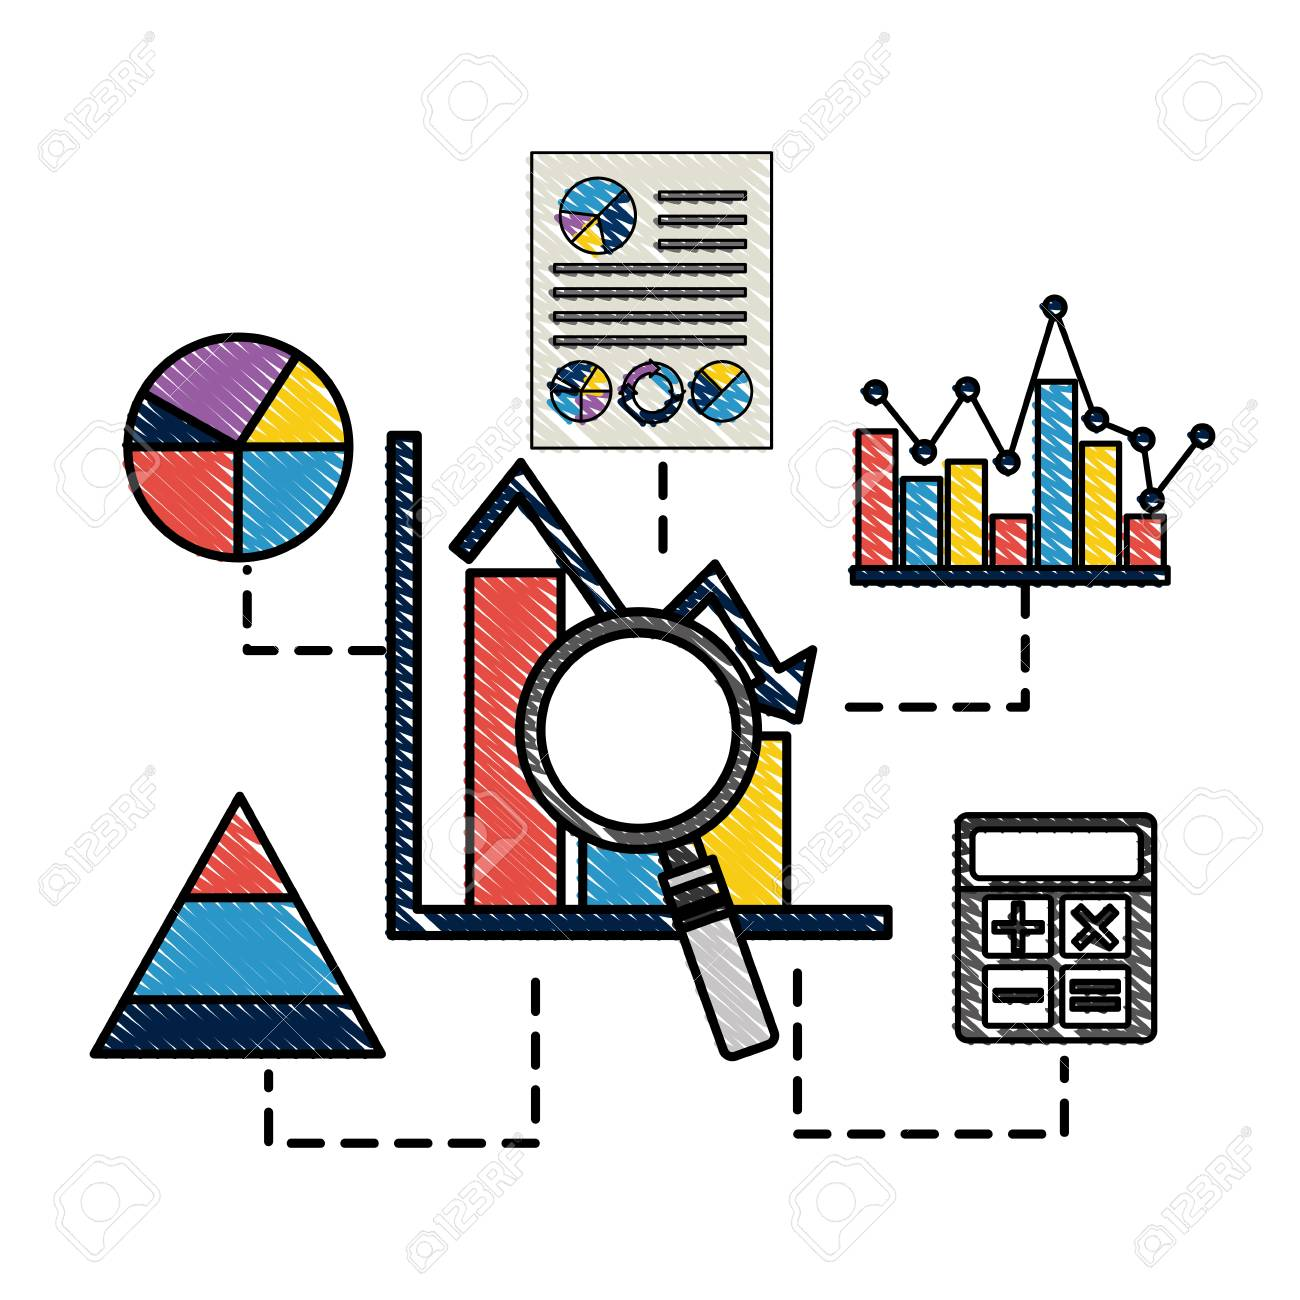 Bar graph statistics analysis calculator business vector bar graph statistics analysis calculator business vector illustration stock vector 97886828 ccuart Image collections